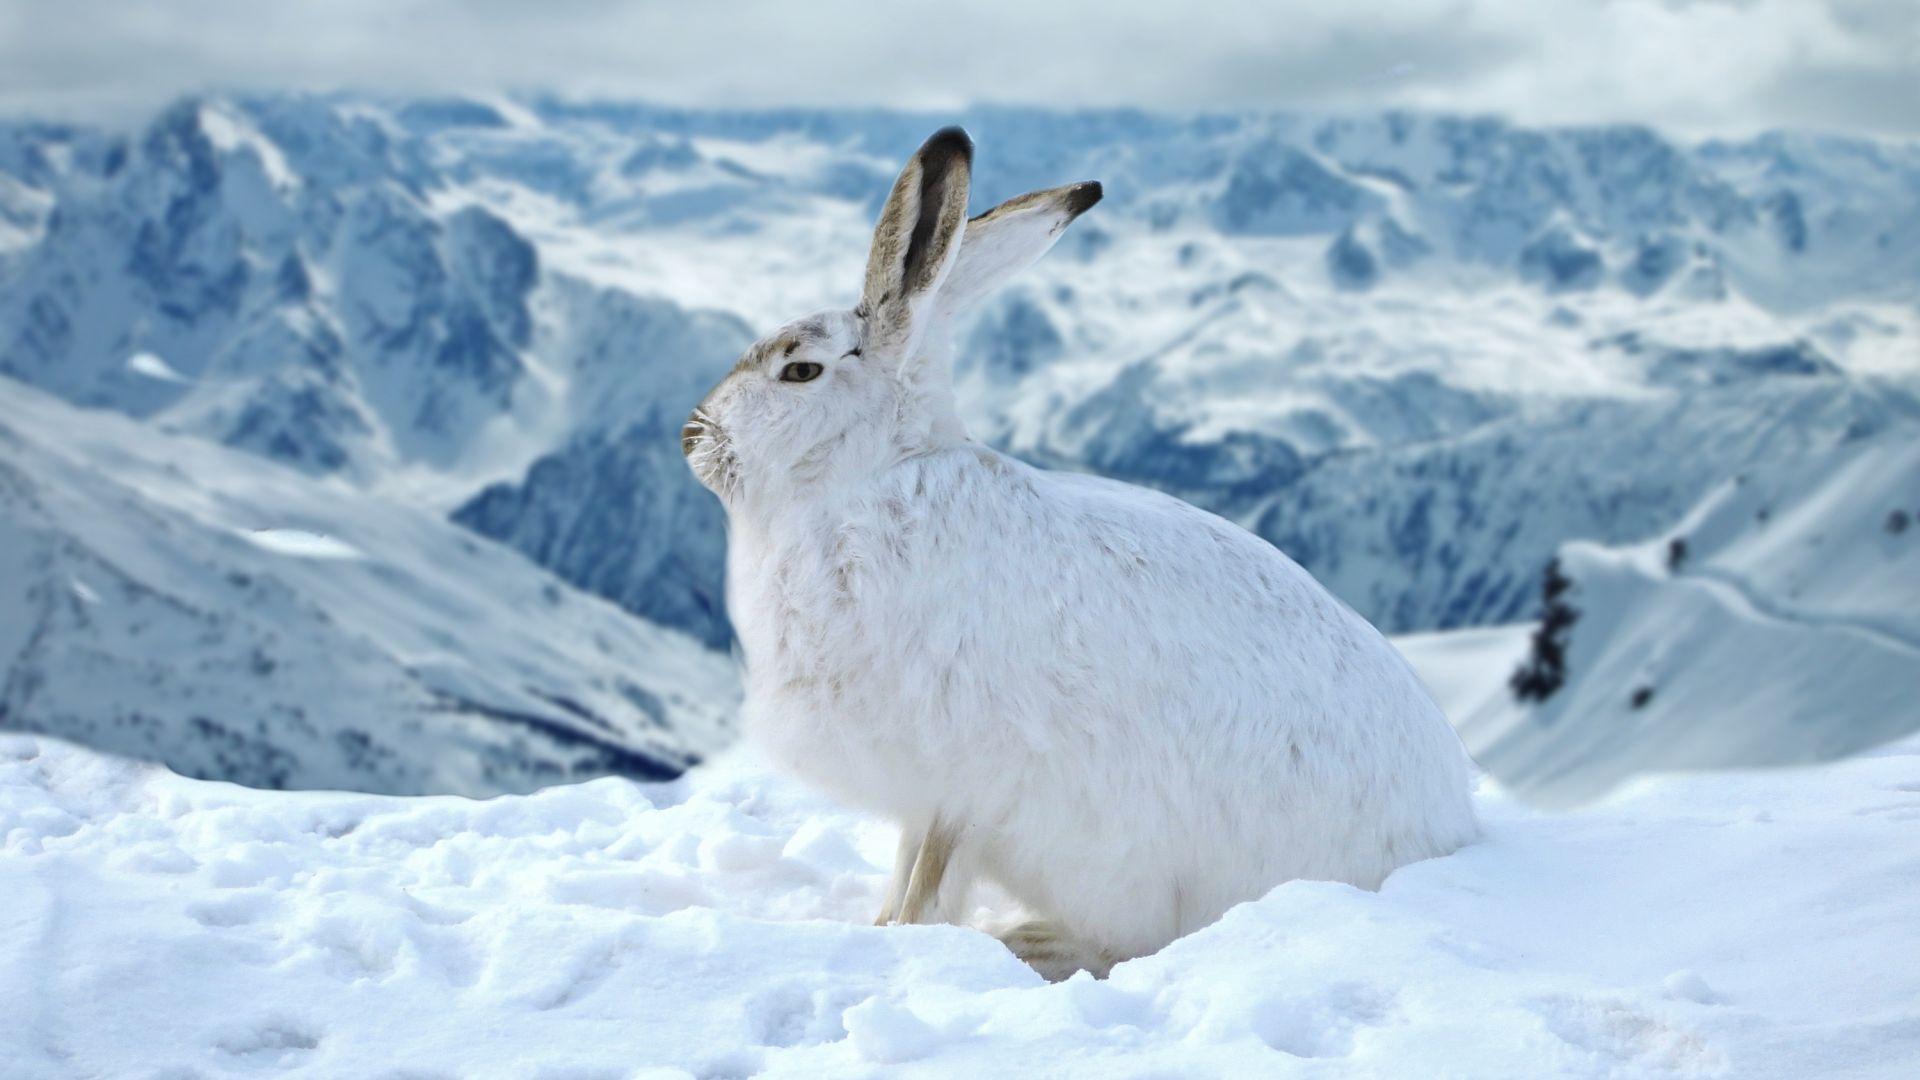 Wallpaper Bunny, rabbit, animal, winter, outdoor